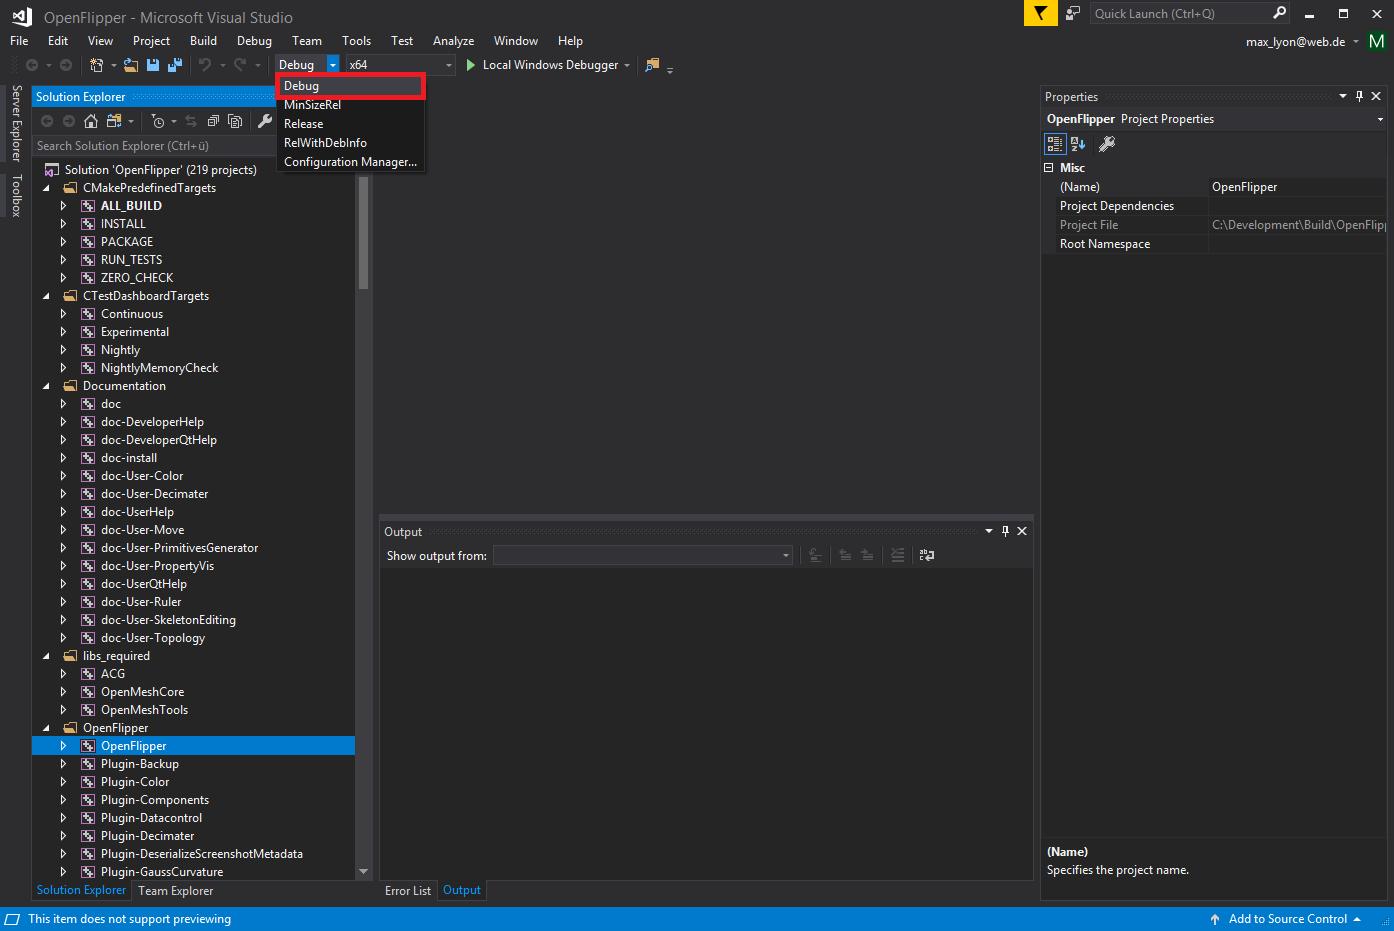 Documentation/DeveloperHelpSources/building-screenshots/15_choose_build_type.png